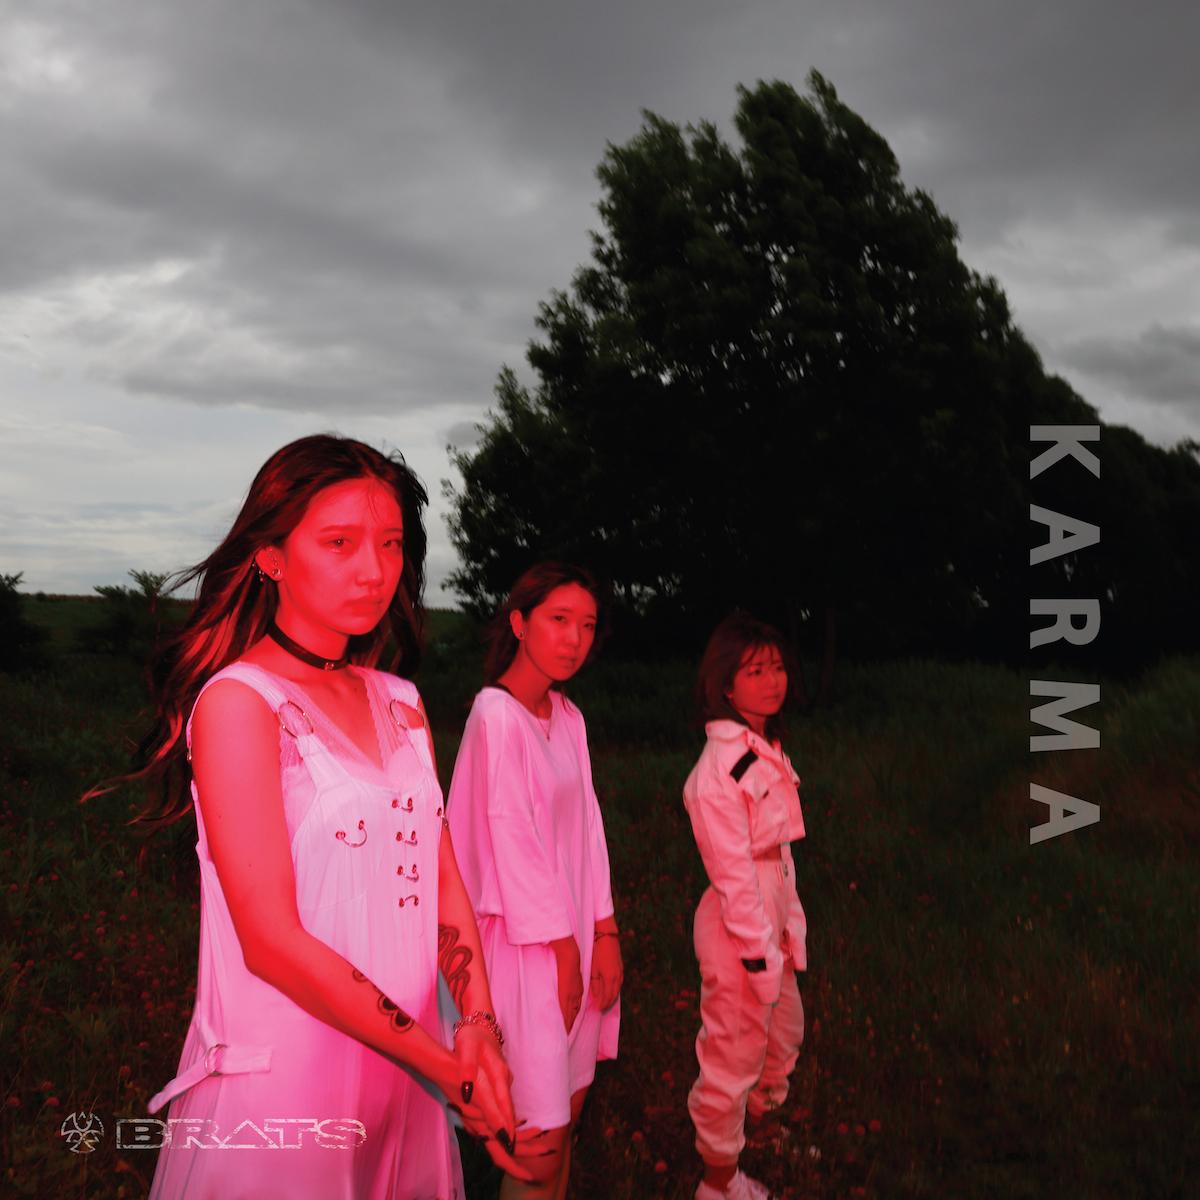 BRATS、NEW ALBUM『Karma』のジャケット画像及び収録内容を公開サムネイル画像